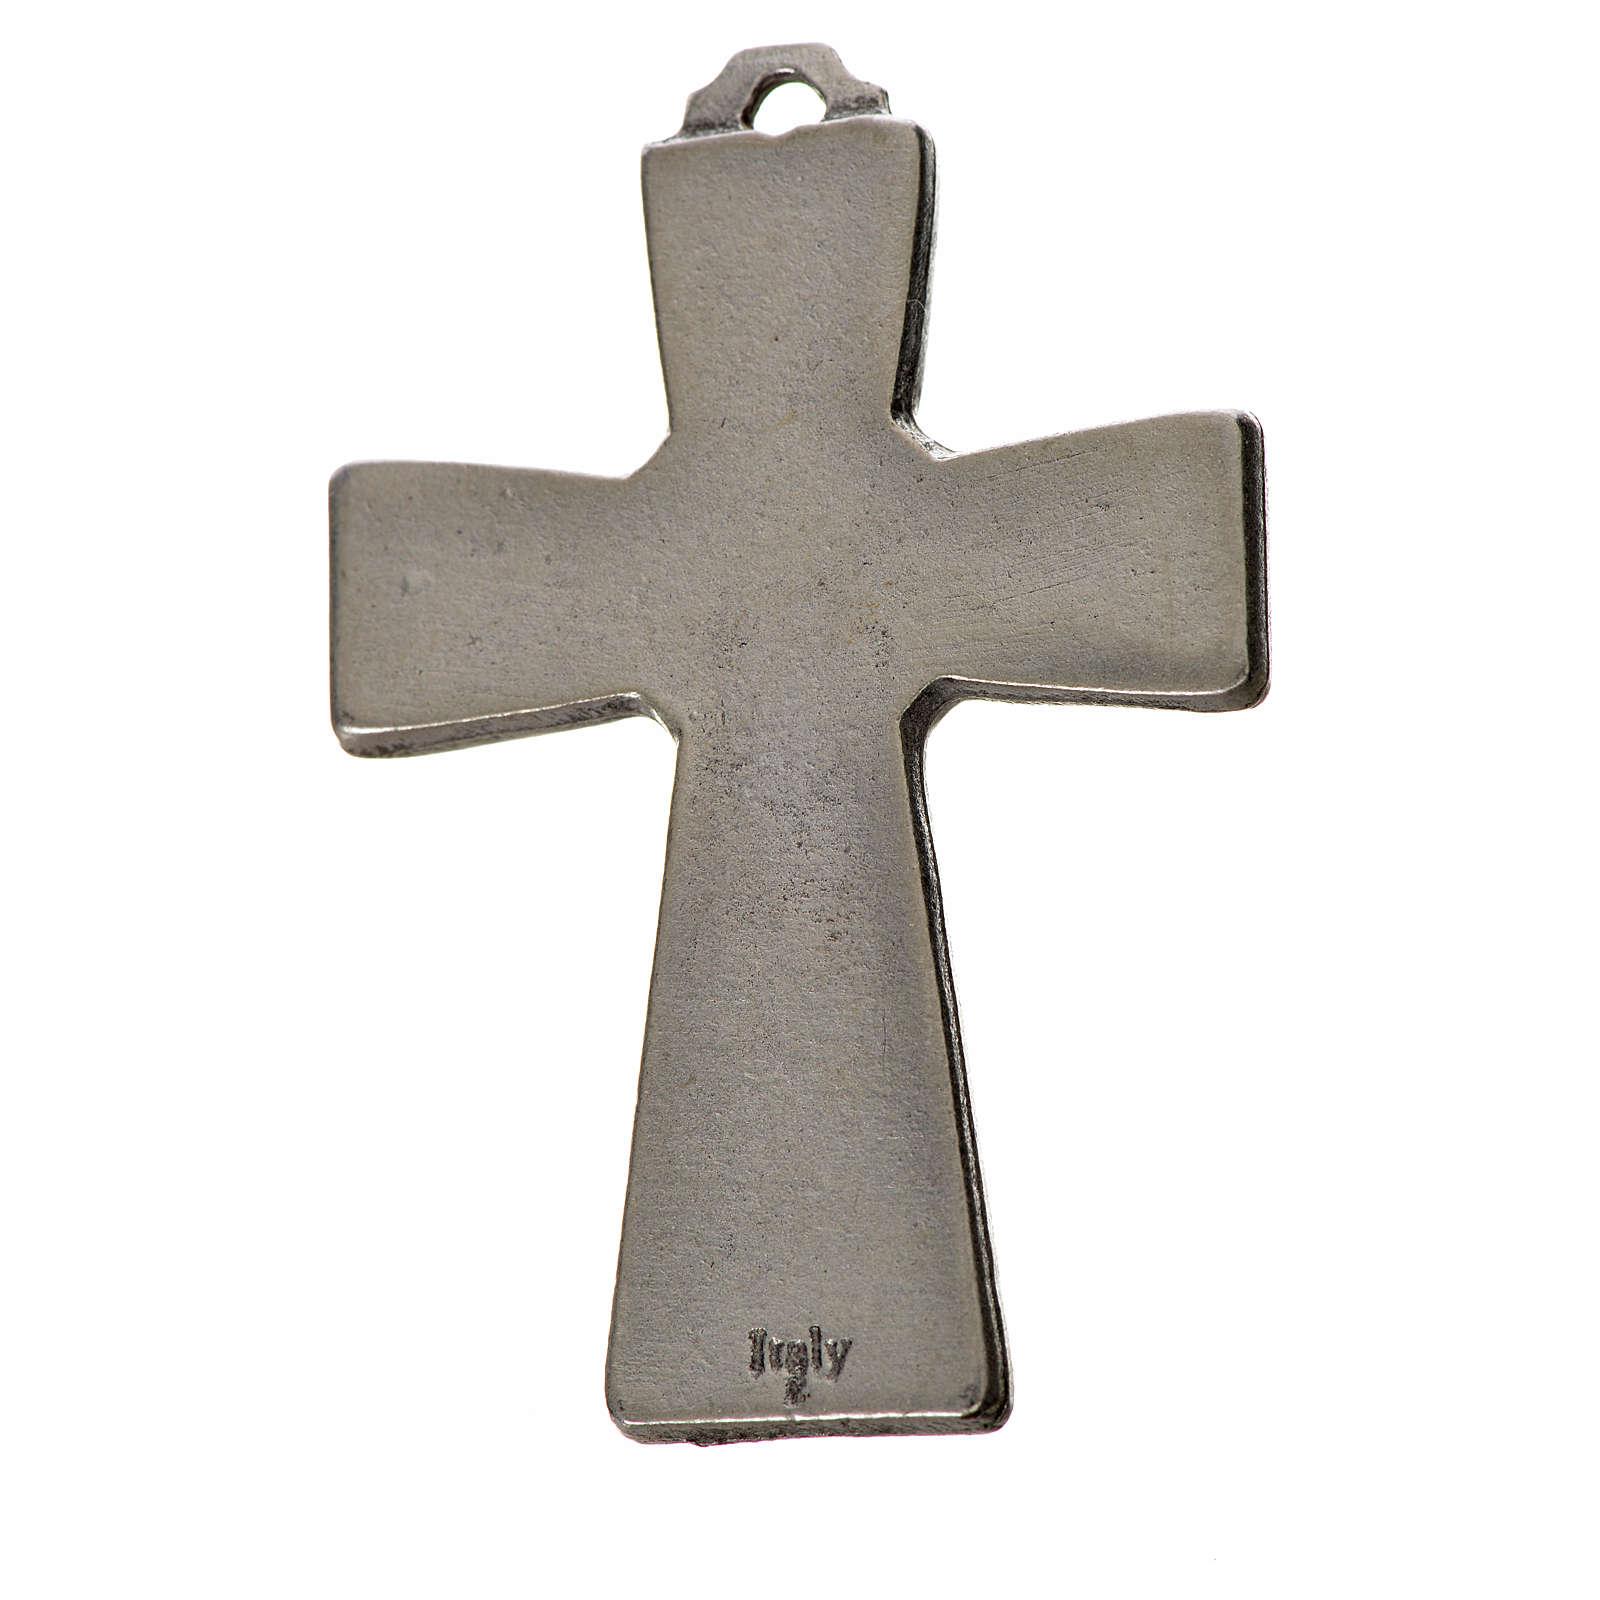 Cruz trilobulada Espíritu Santo 5x3.5cm zamak y esmalte negro 4